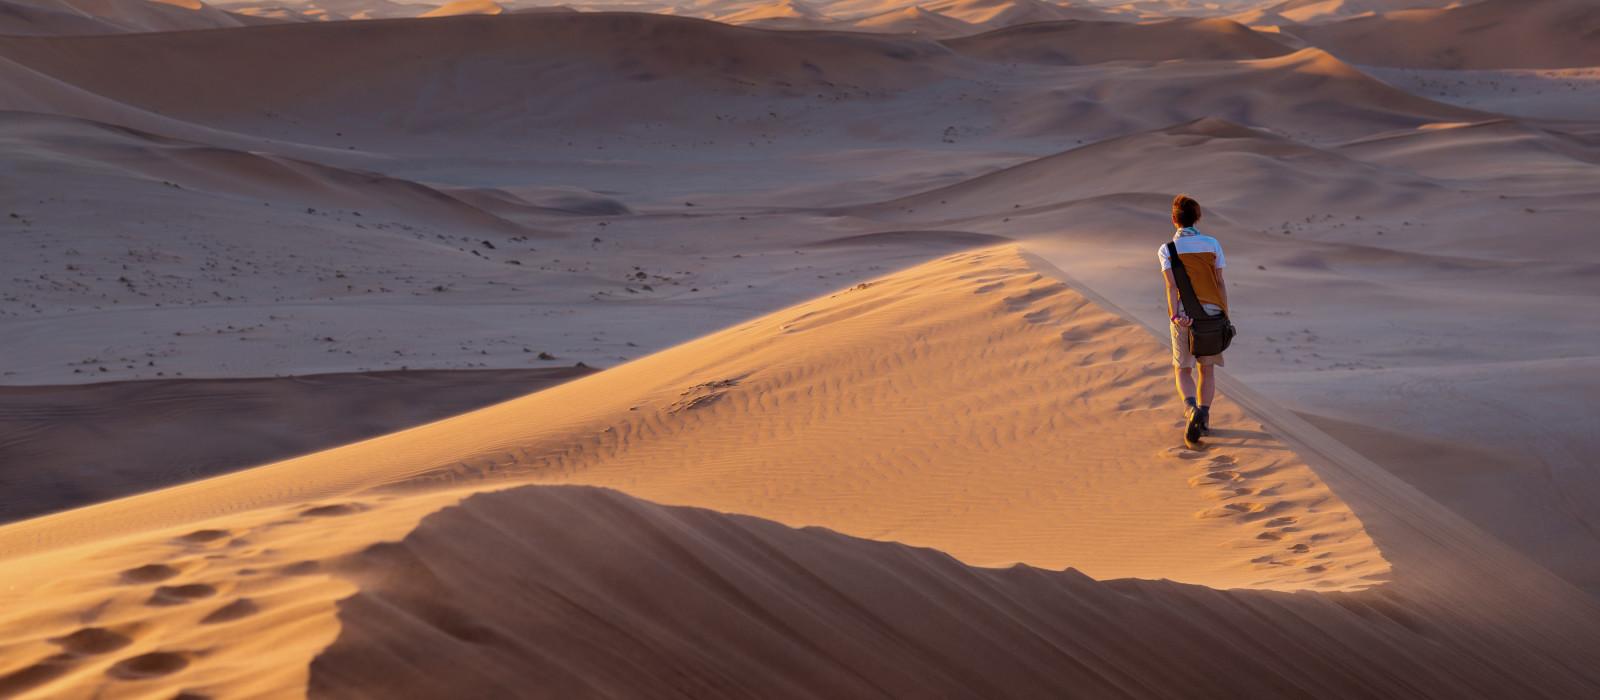 Tourist walking on the scenic dunes of Sossusvlei, Namib desert, Namib Naukluft National Park, Namibia, Africa